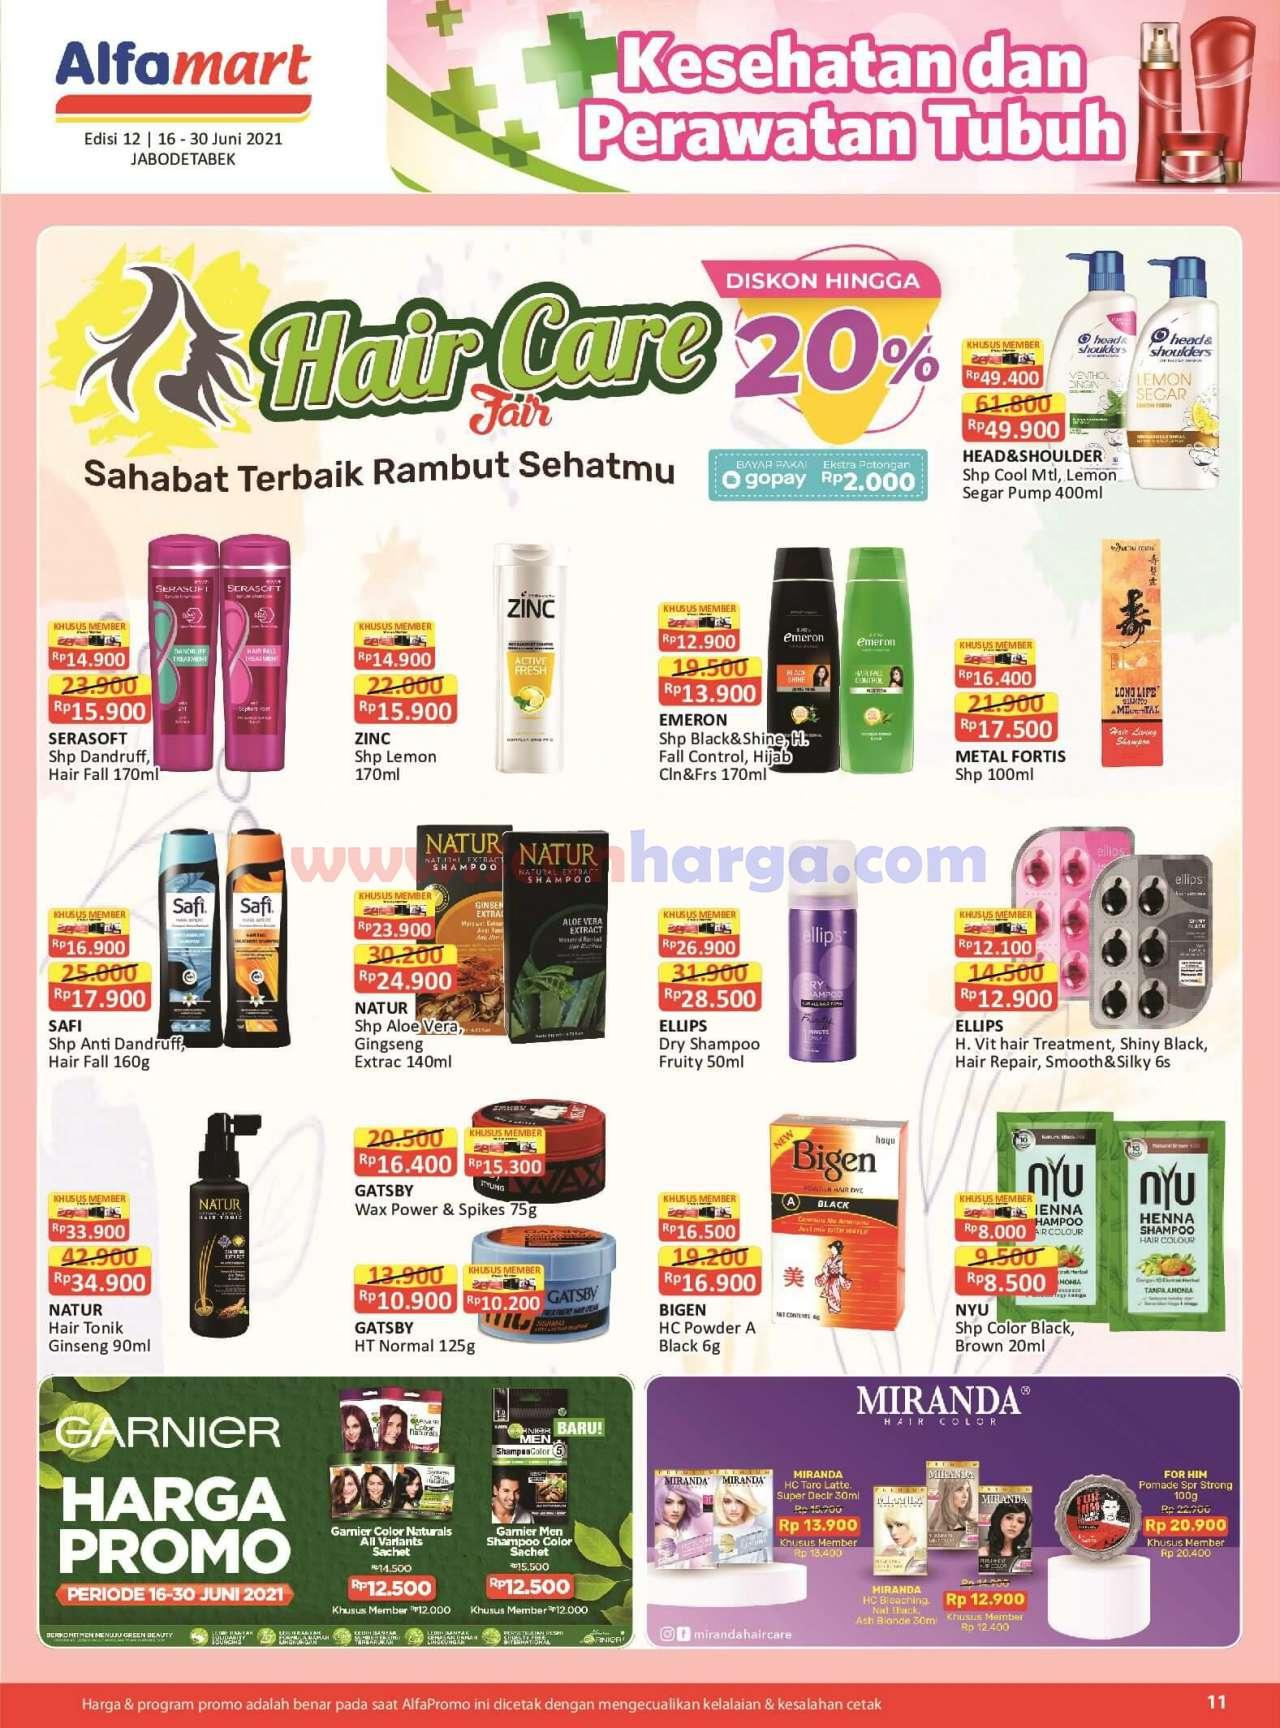 Katalog Promo Alfamart 16 - 30 Juni 2021 11